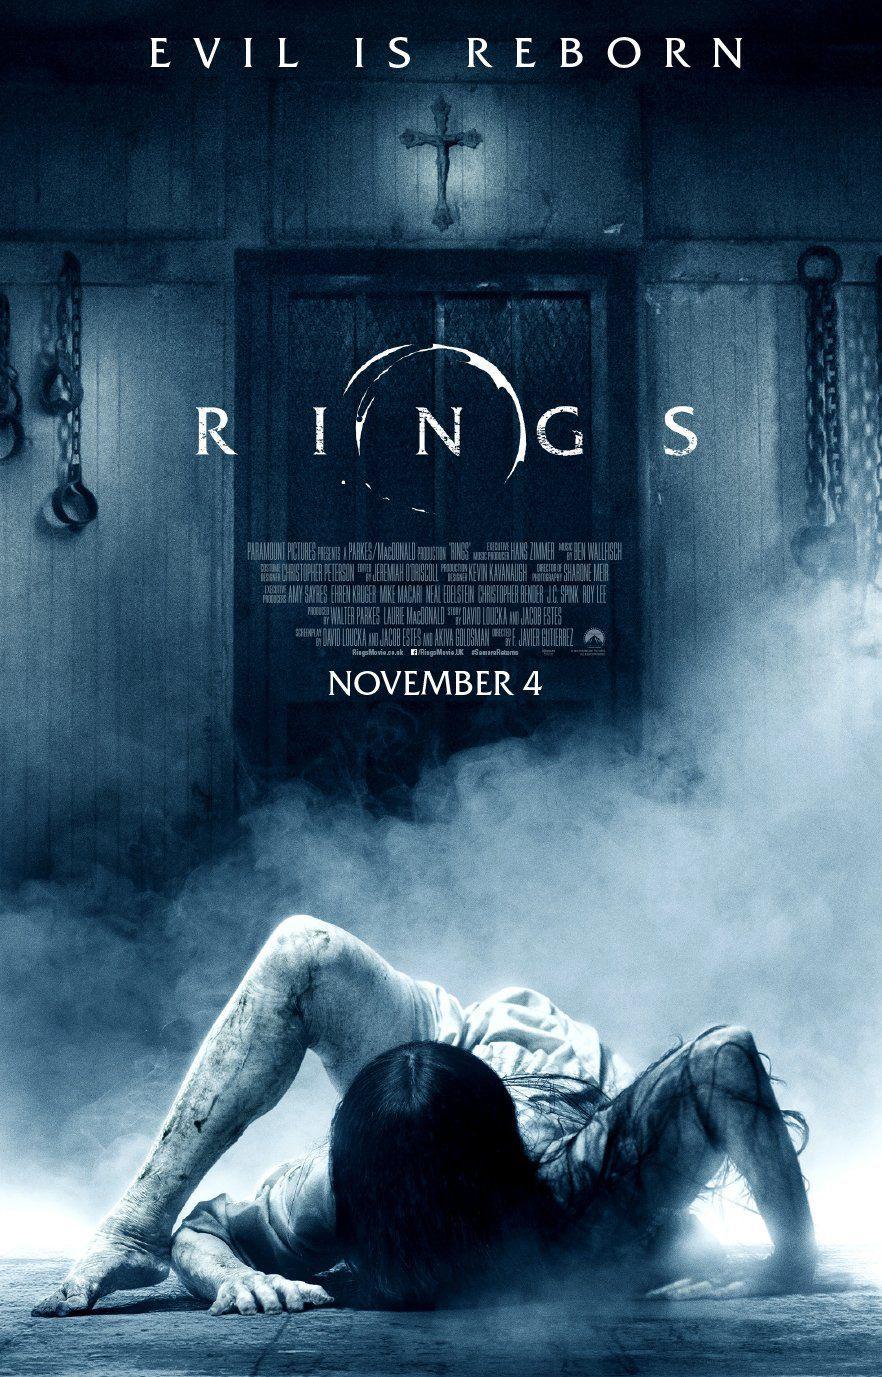 Rings 3 2017 Online Subtitrat In Romana Filme Online 2017 Hd Subtitrate In Romana Filme Noi Gratis Online